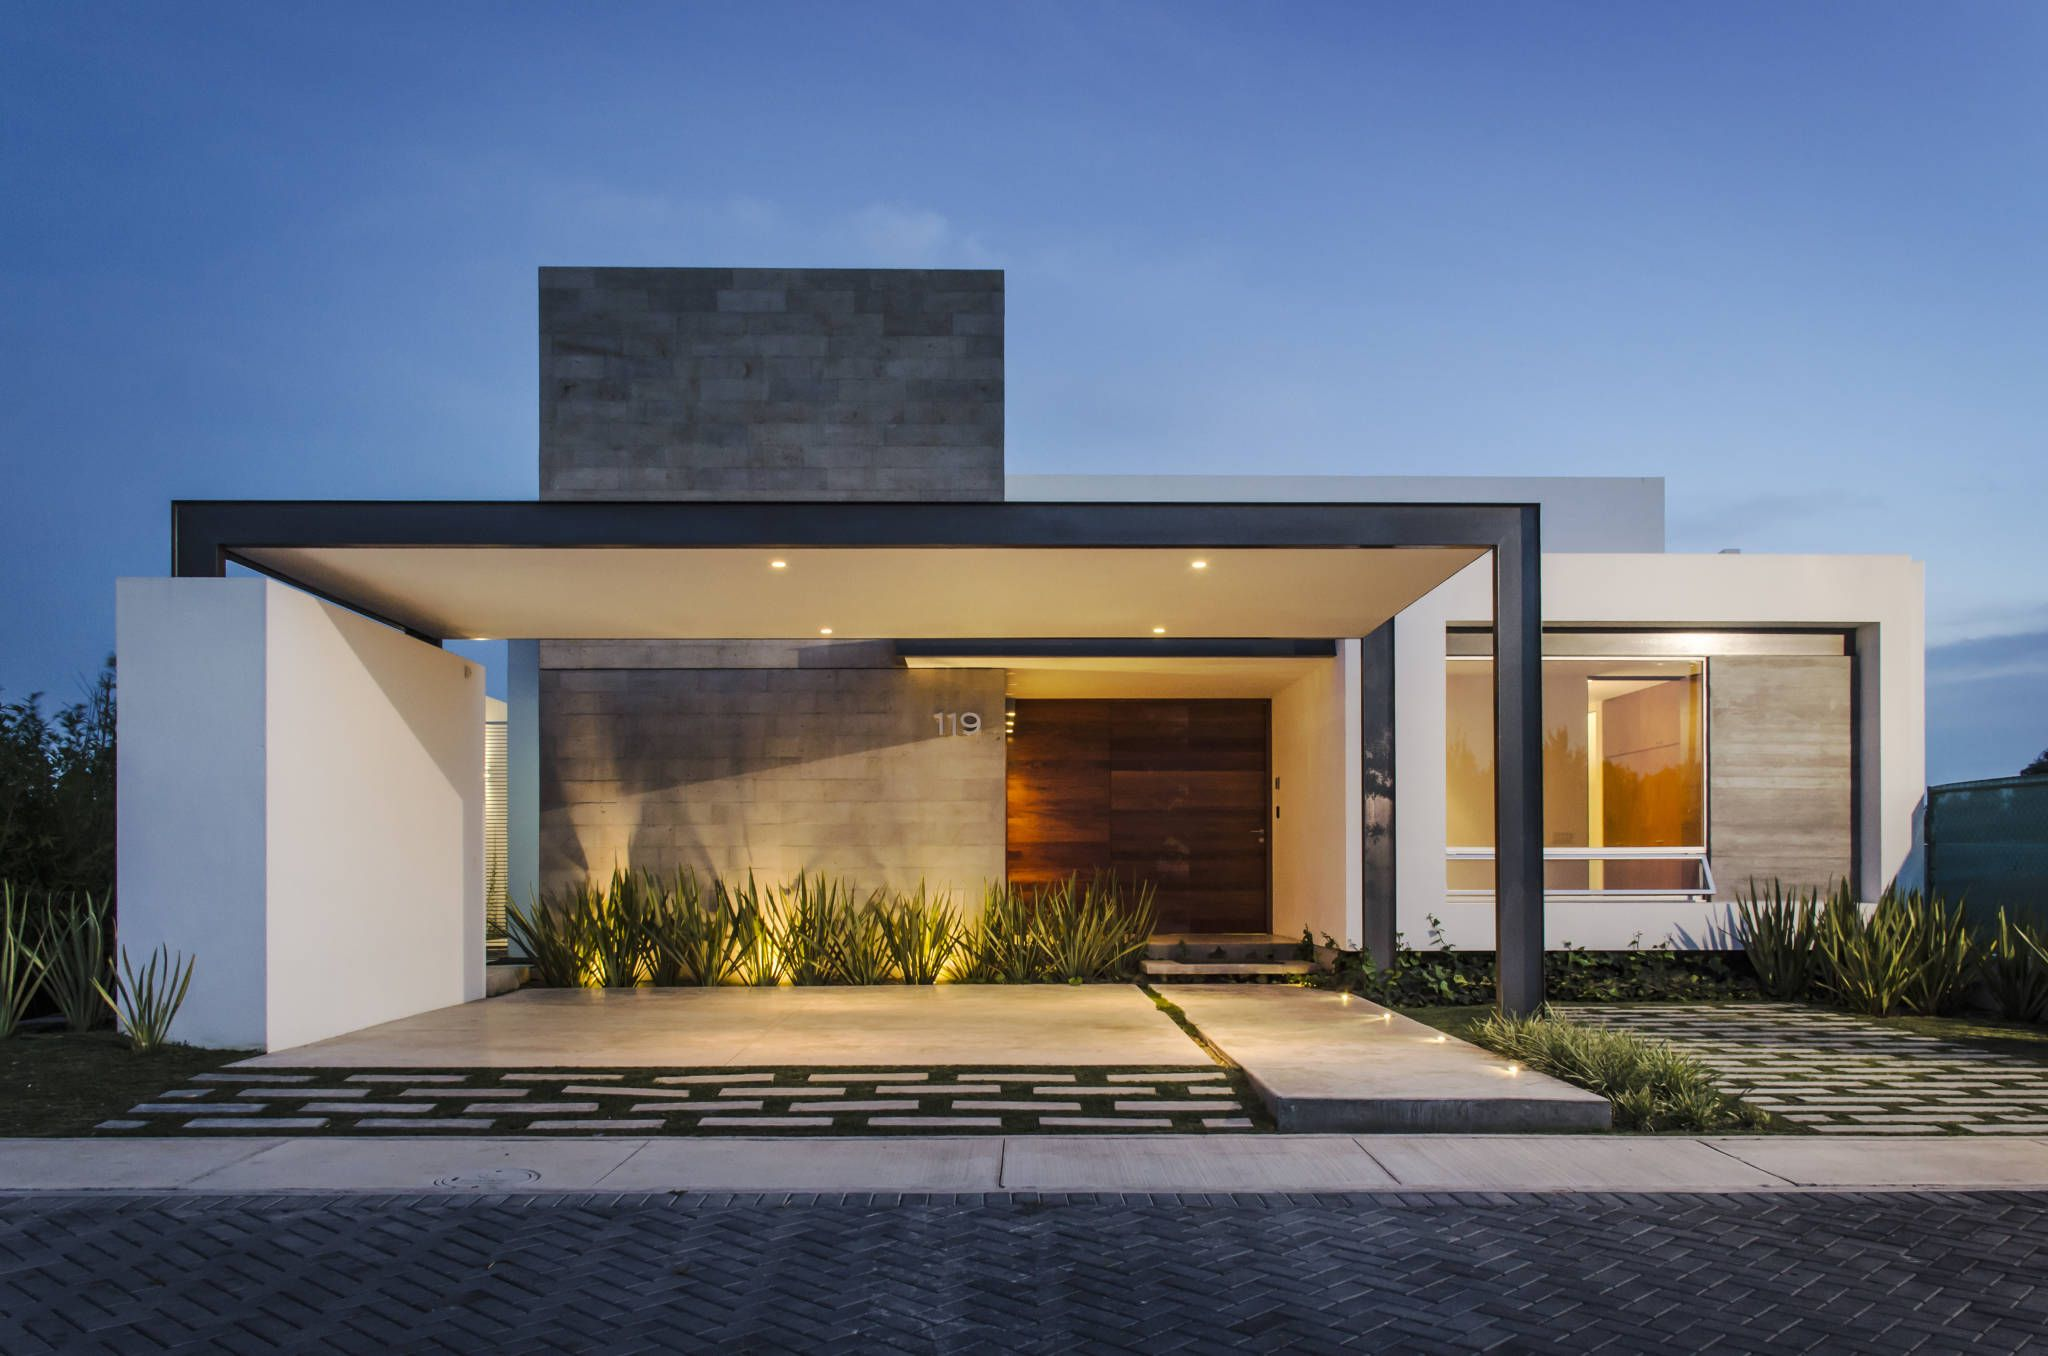 Architettura Case Moderne Idee case moderne di homify moderno | design case moderne